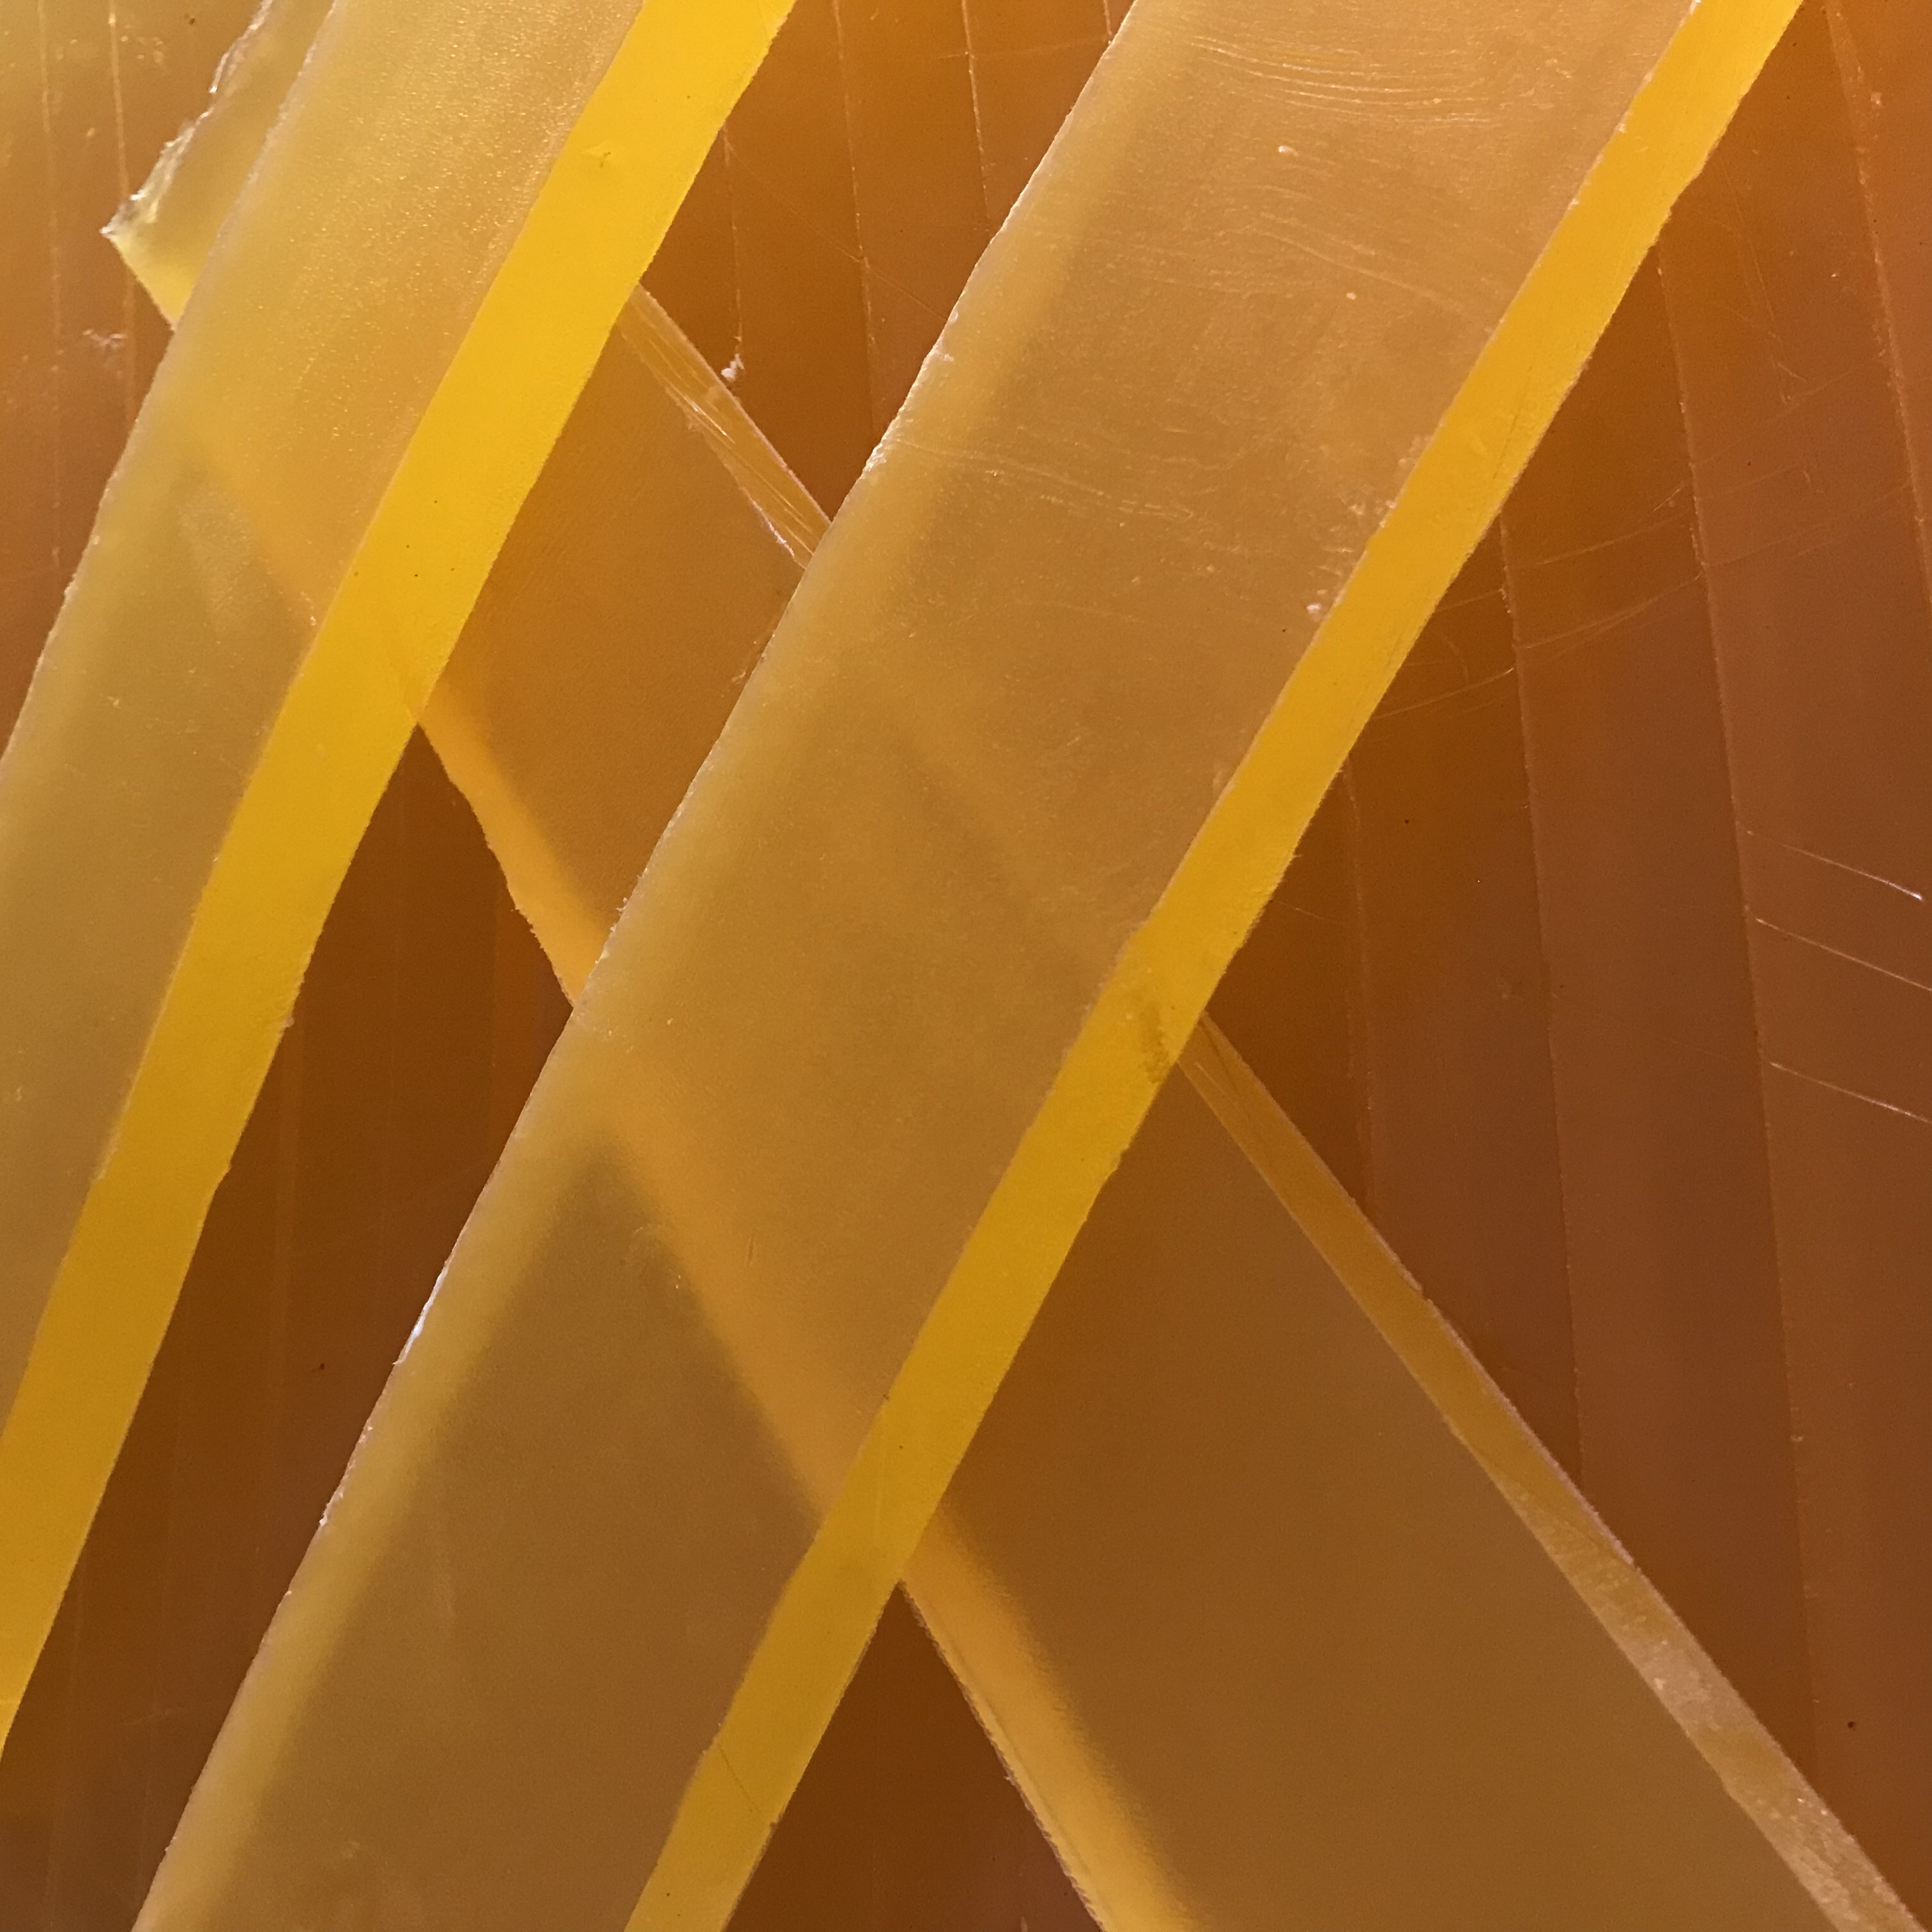 wholesale handmade customized gold color honey melt and pour glycerine soap base